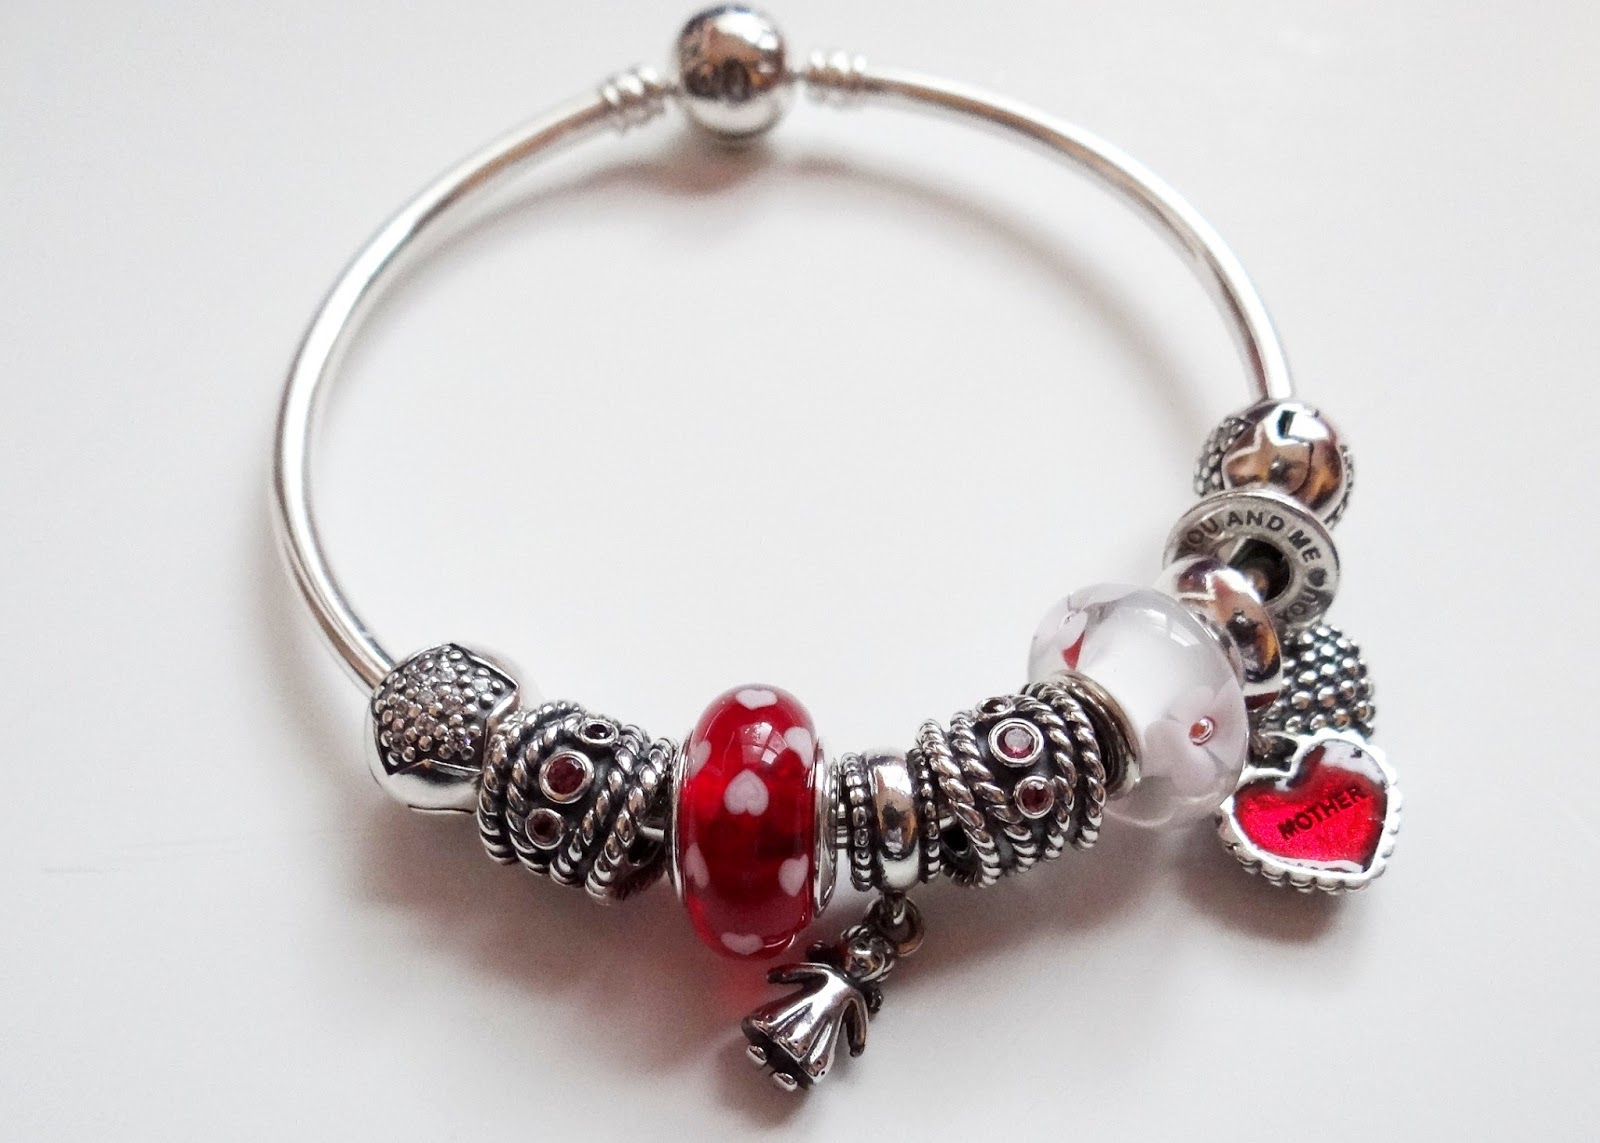 Pandora Mother Daughter Bracelets